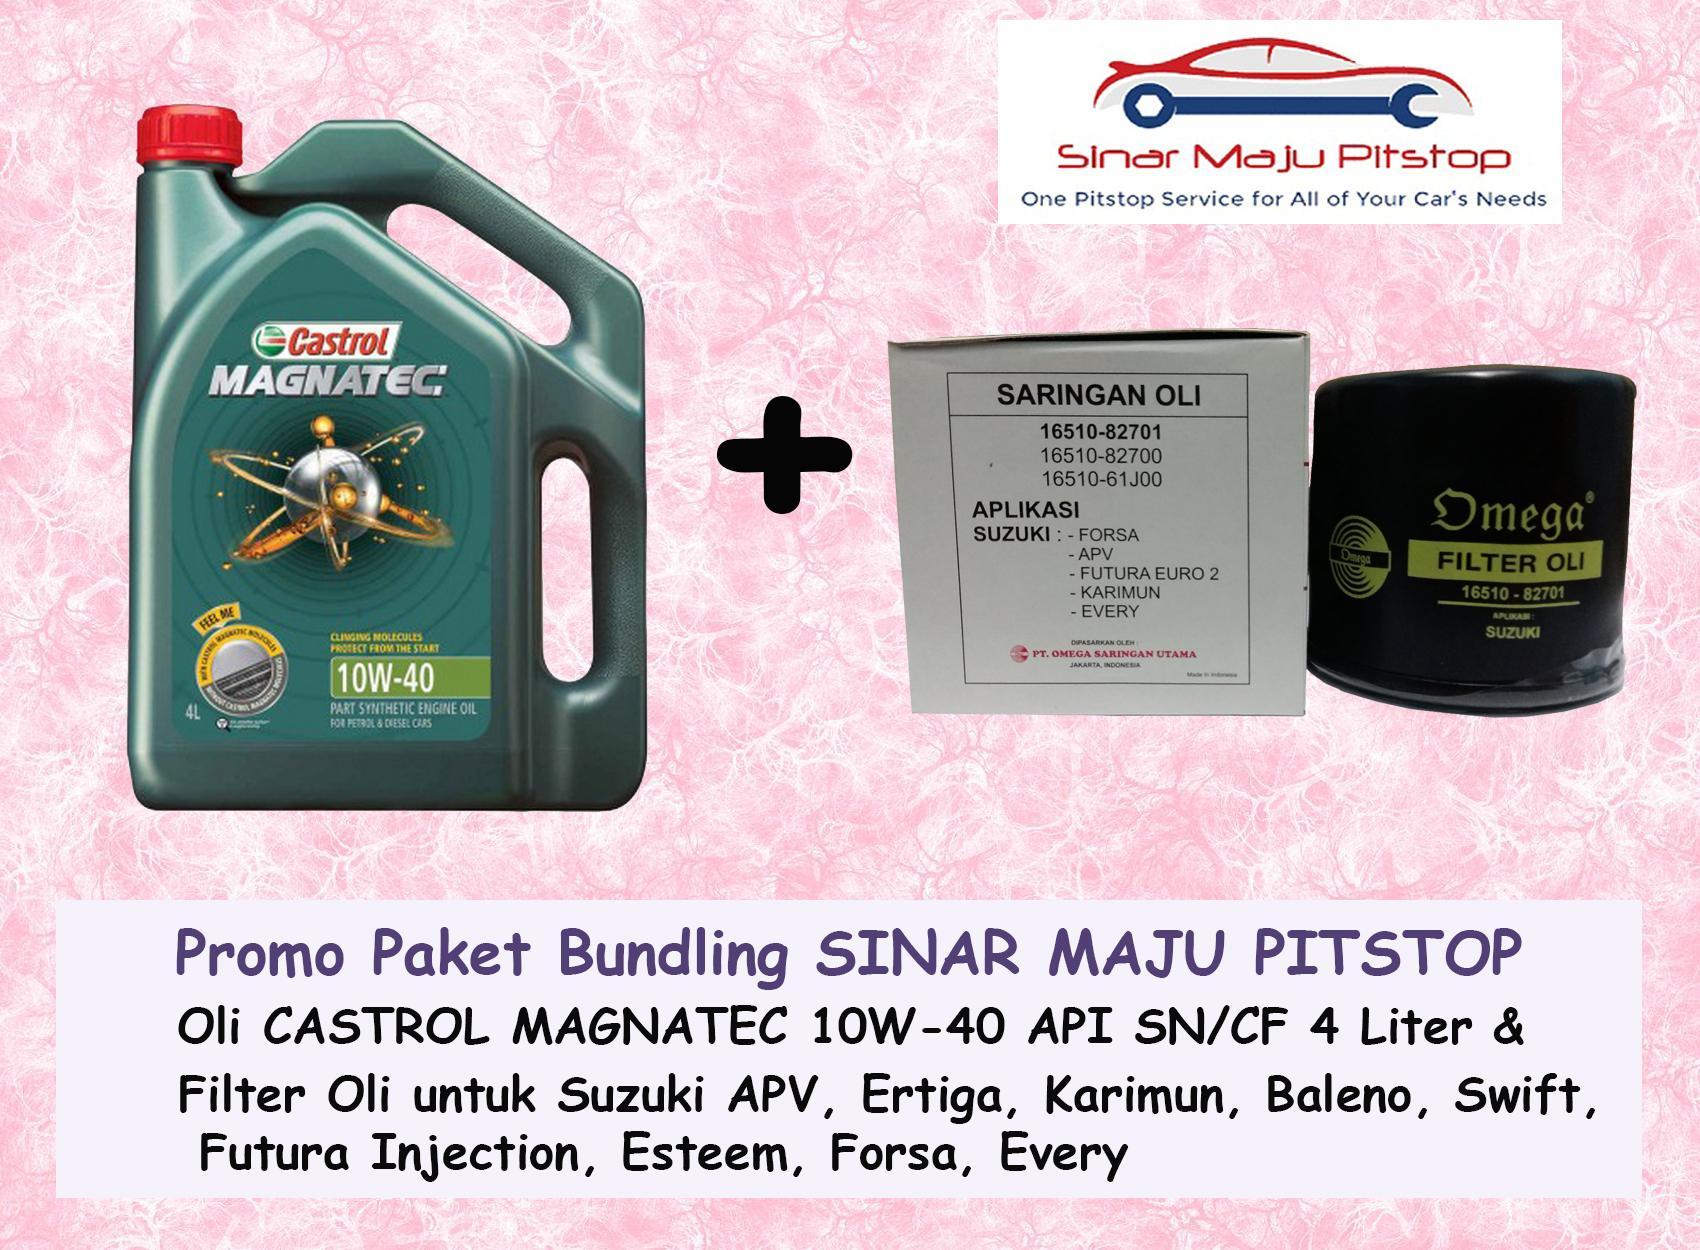 Paket Bundling Oli Mobil CASTROL MAGNATEC 10W-40 API SN 4 LITER & Filter Oli SUZUKI FUTURA INJECTION ORIGINAL